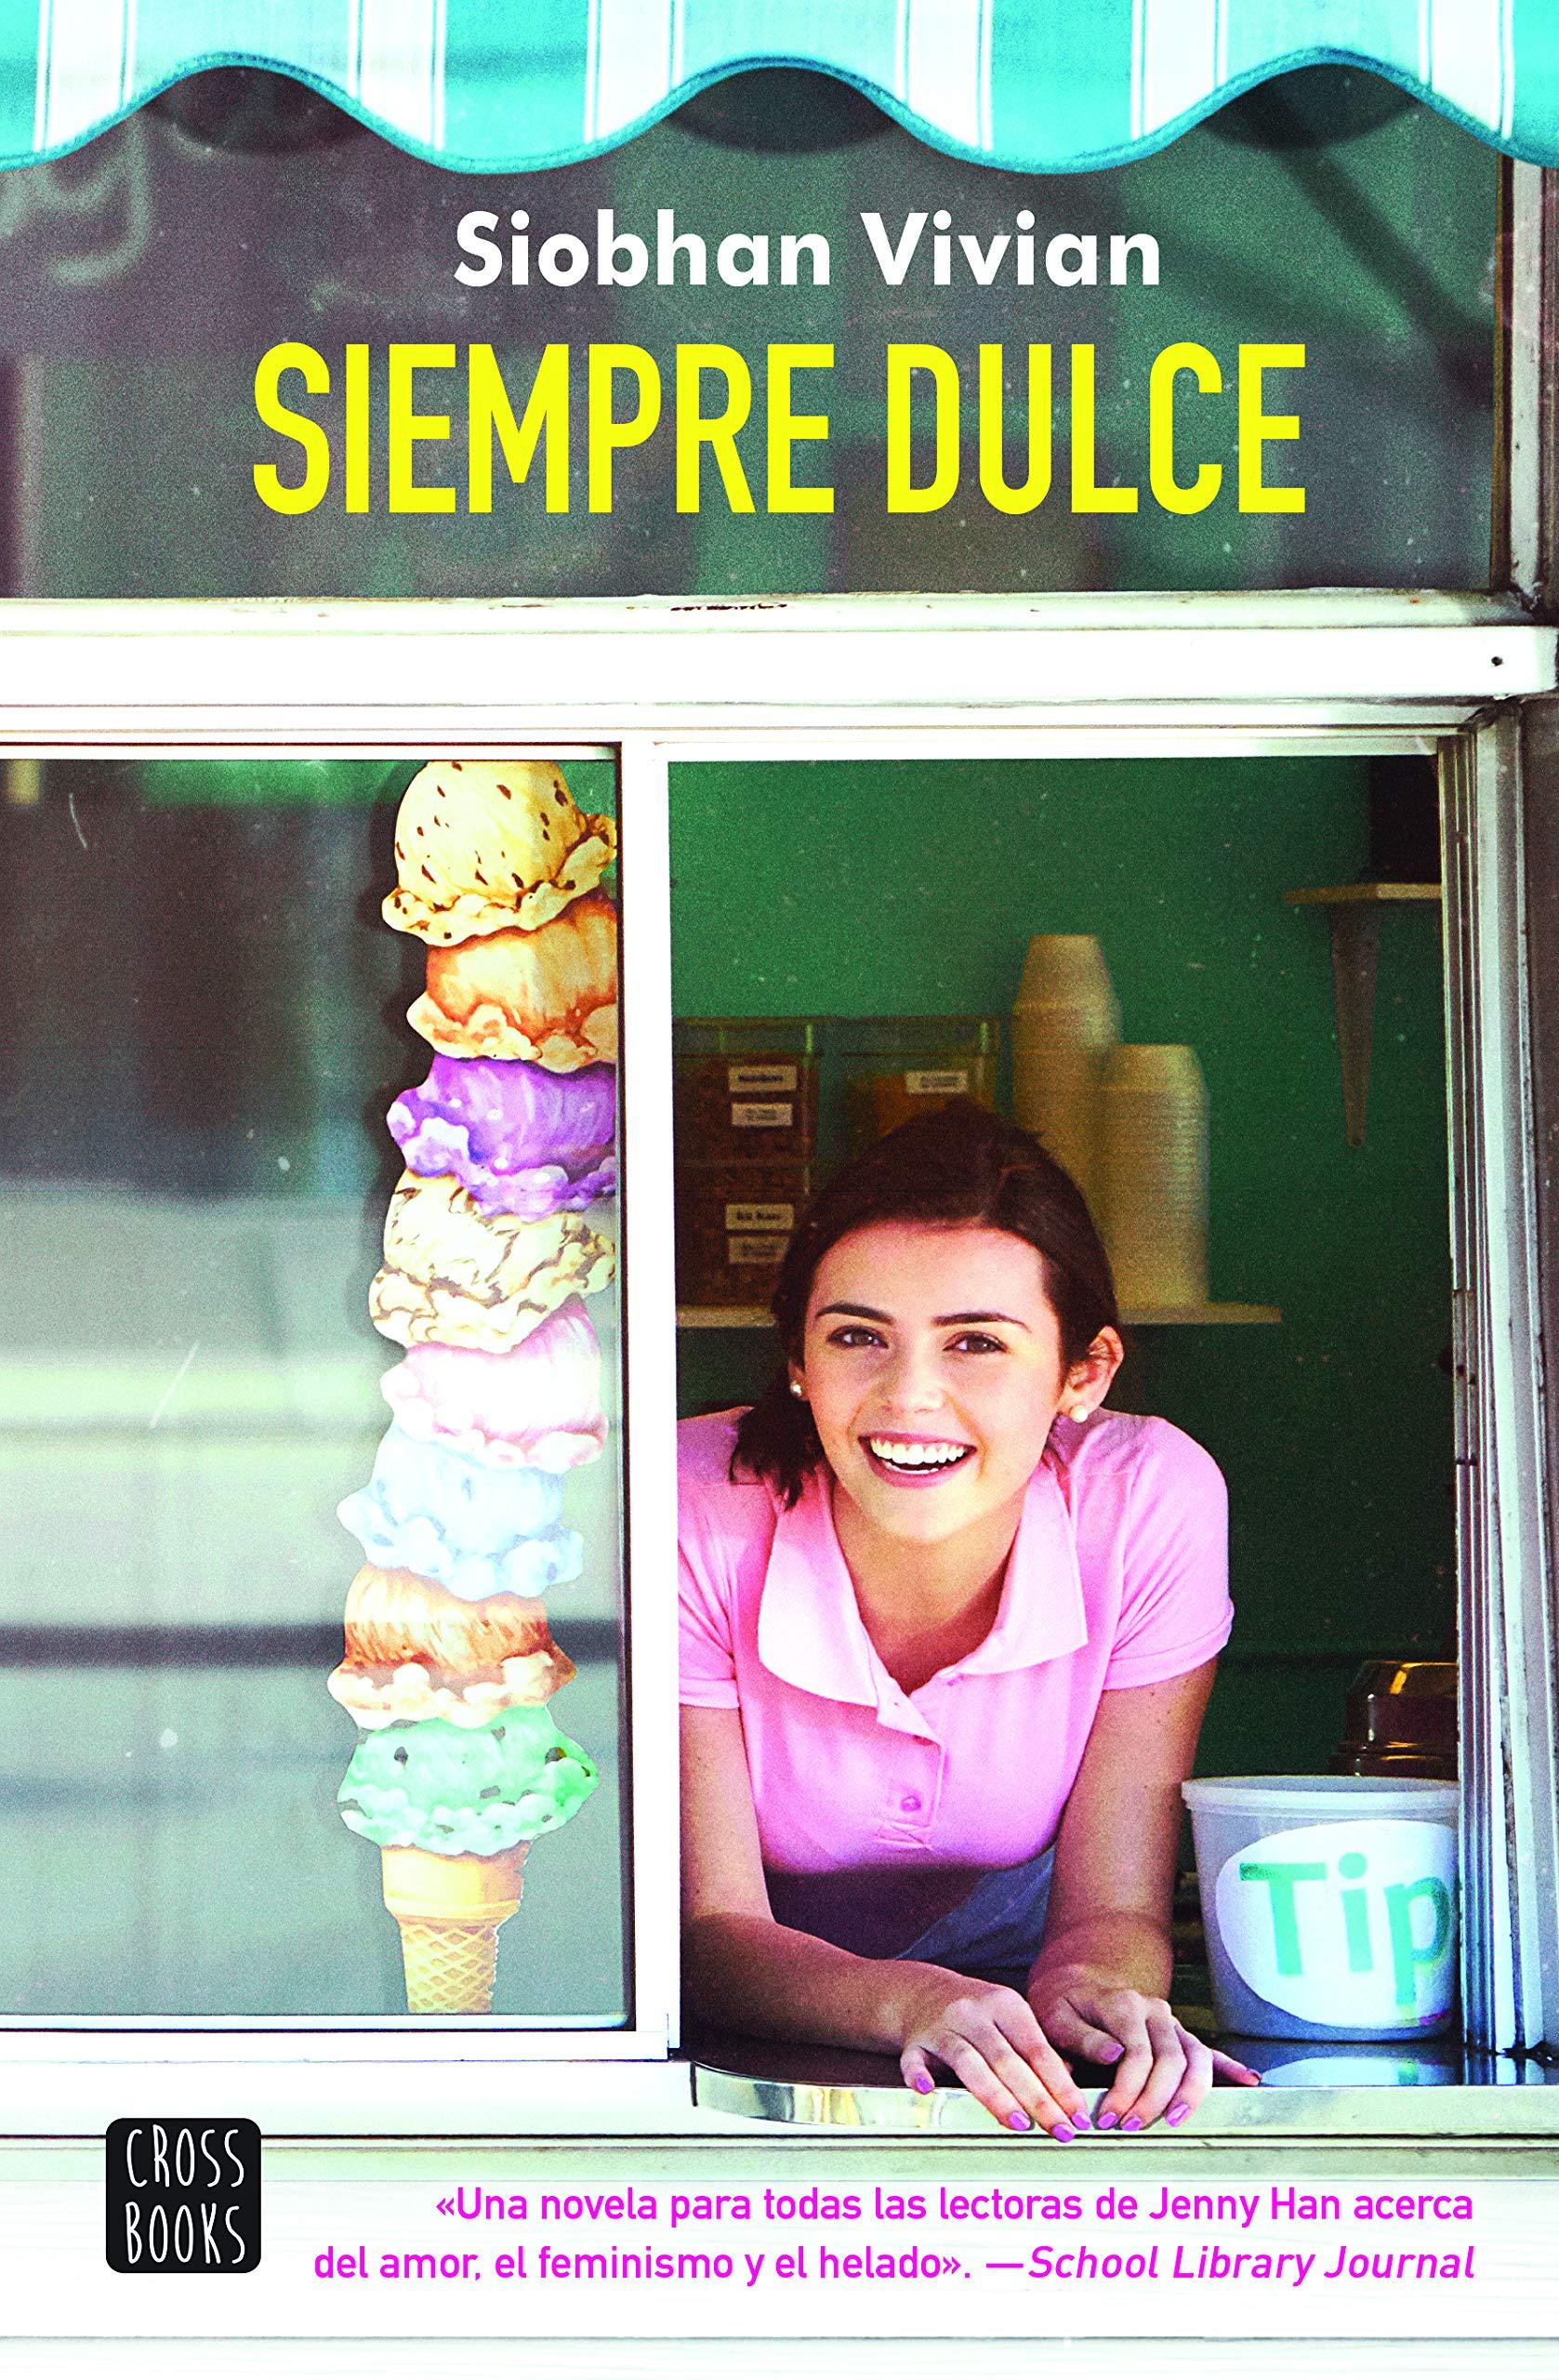 Amazon.com: Siempre dulce (Spanish Edition) (9786070758249): Siobhan Vivian: Books